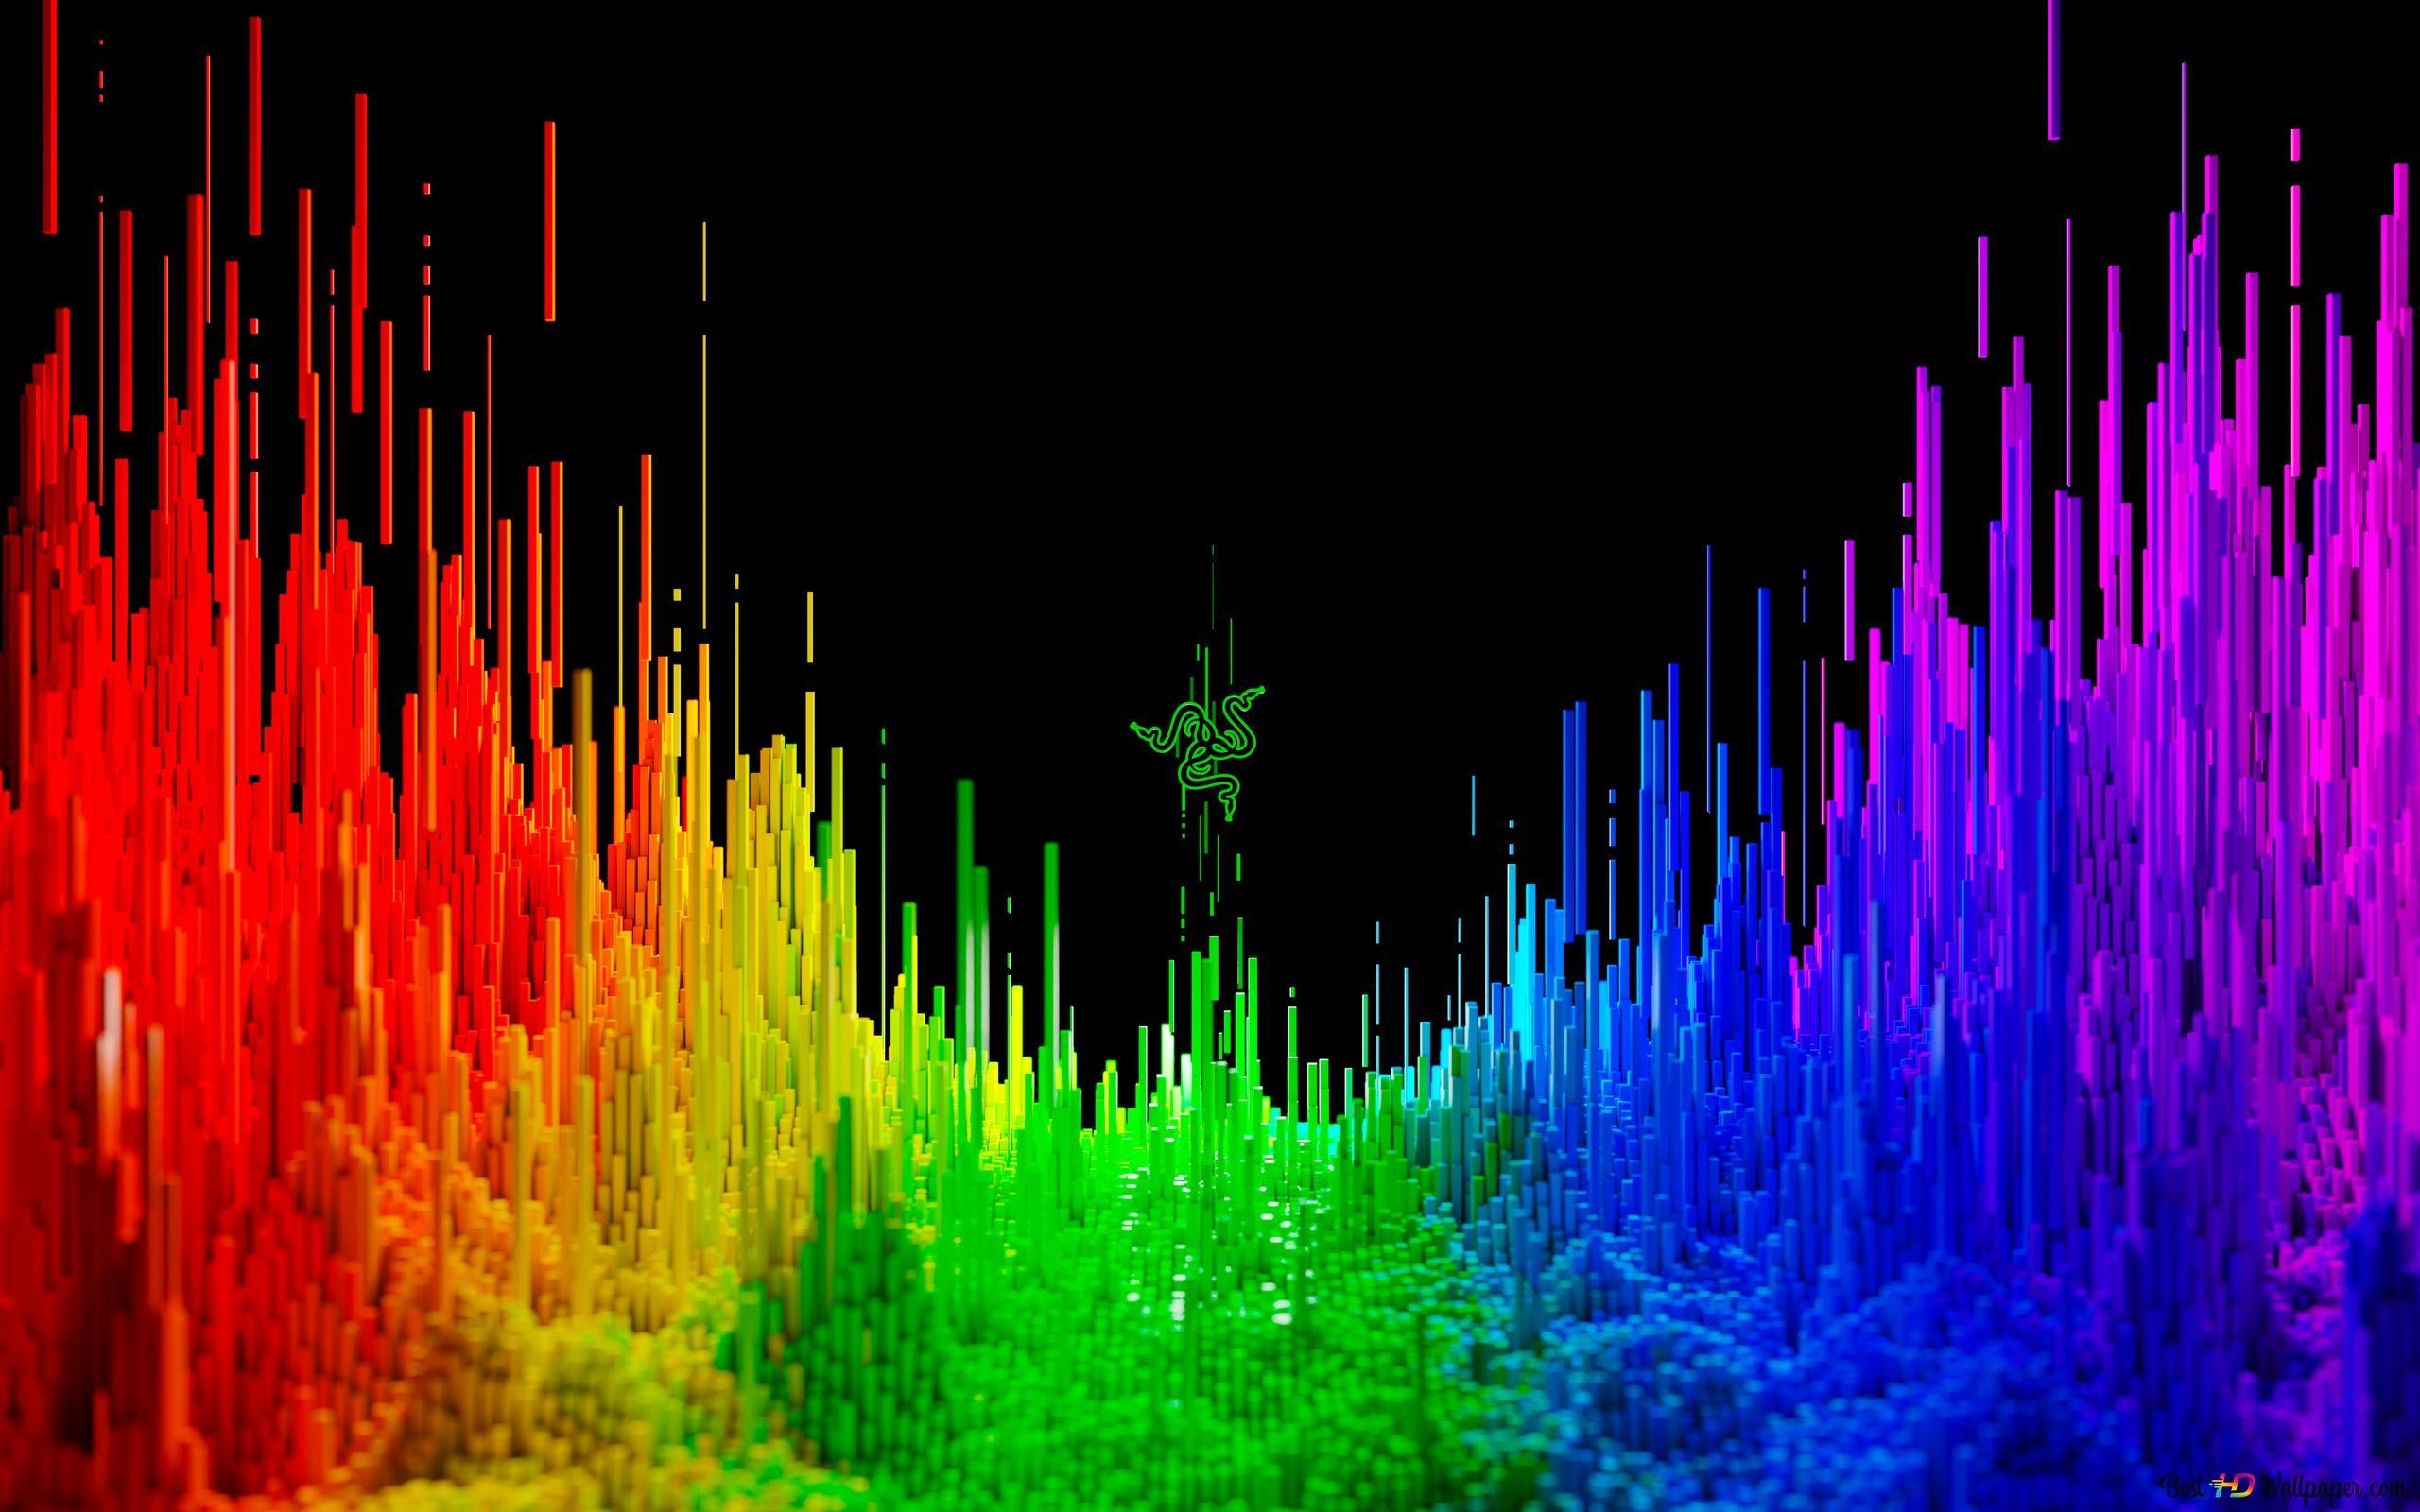 razer technology 3d rainbow background wallpaper 2560x1600 891 7